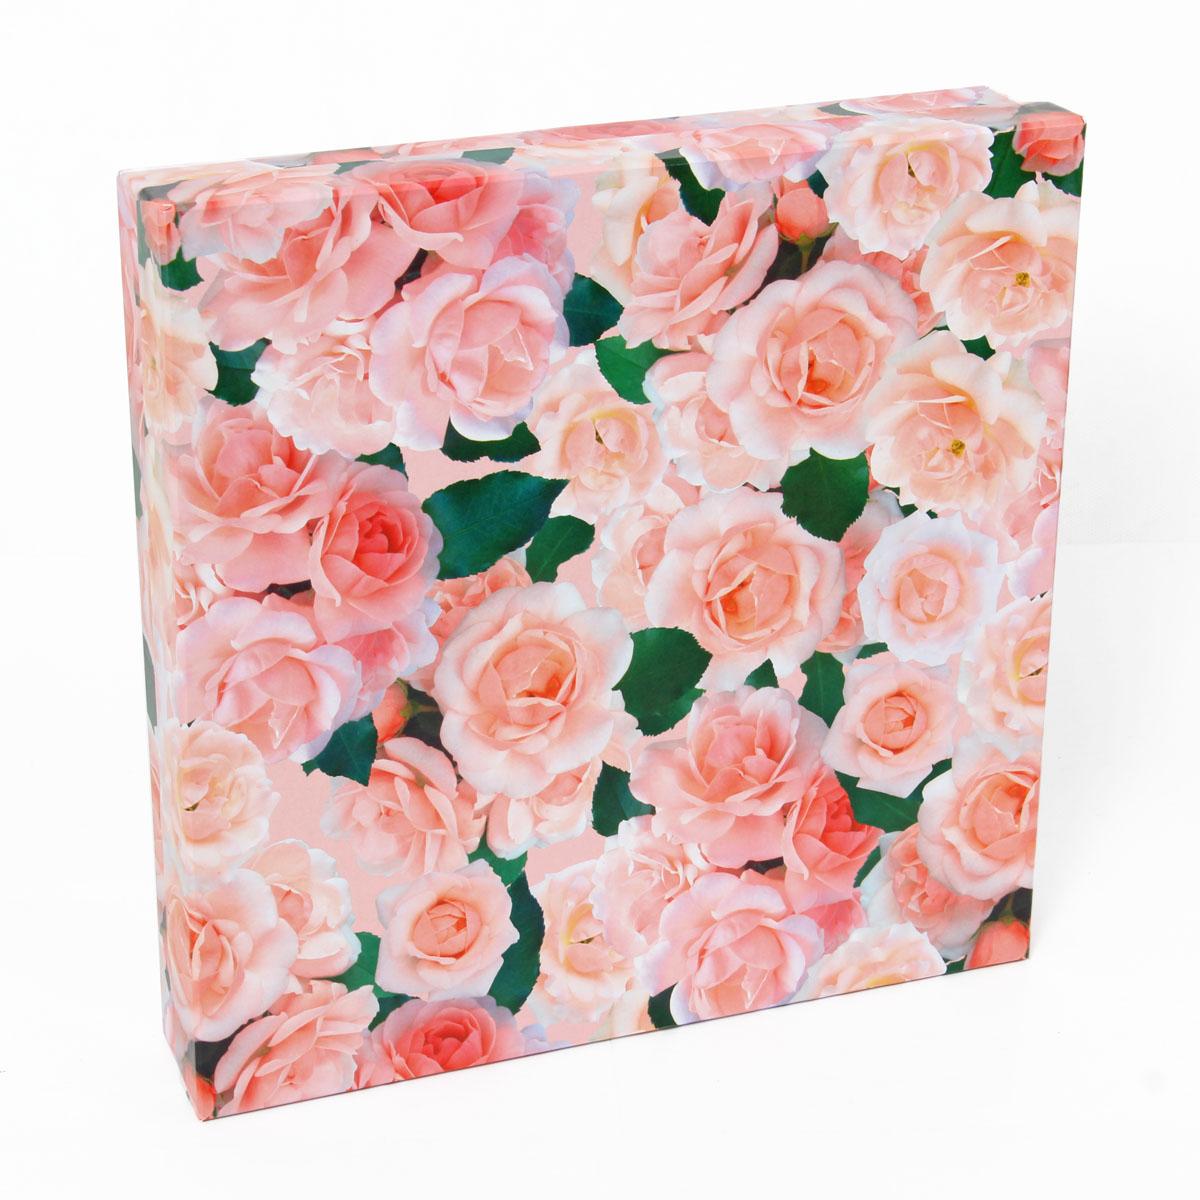 Набор подарочных коробок Veld-Co Нежные розы, 4 шт коробка подарочная veld co giftbox трансформер paris под бутылку цвет бежевый 34 4 х 8 2 х 8 2 см